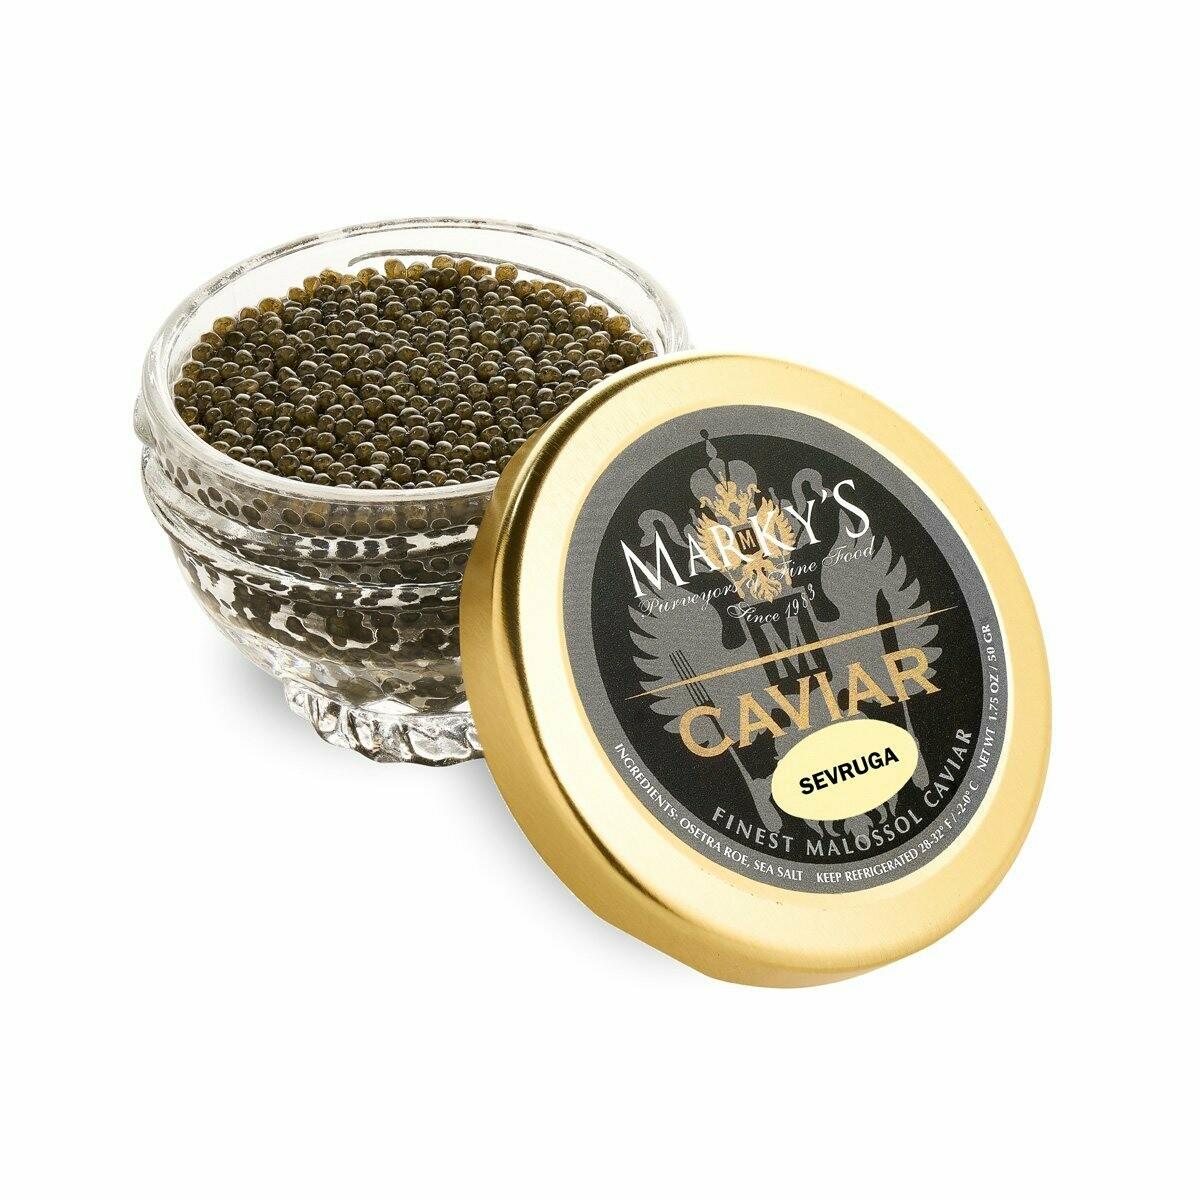 Marky's Sevruga Caviar